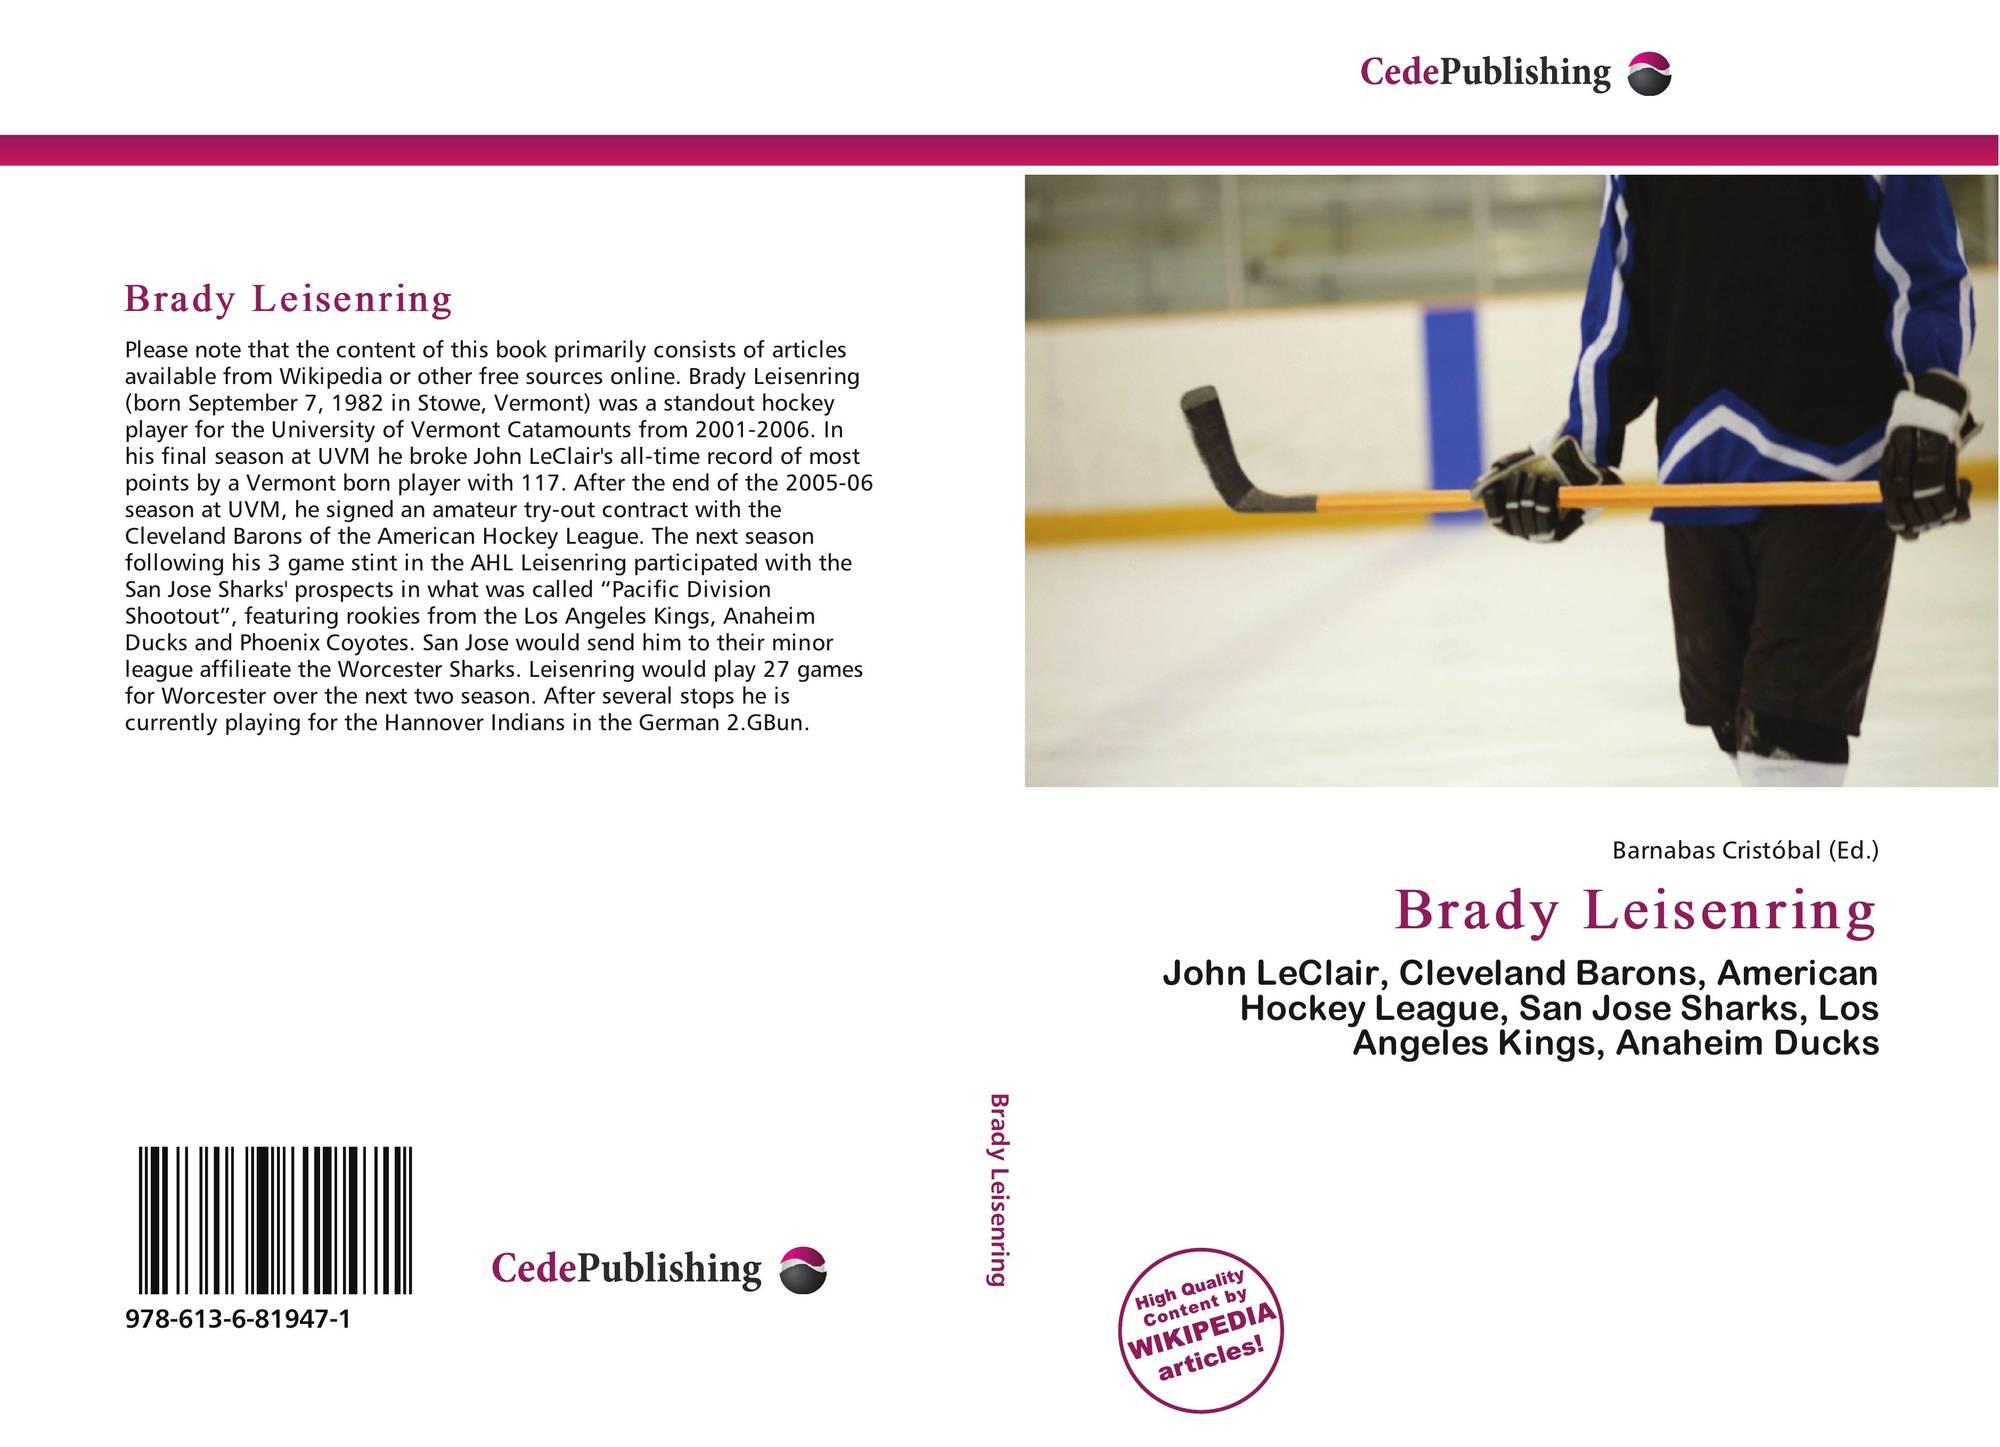 Brady Leisenring 978 613 6 81947 1 6136819473 9786136819471